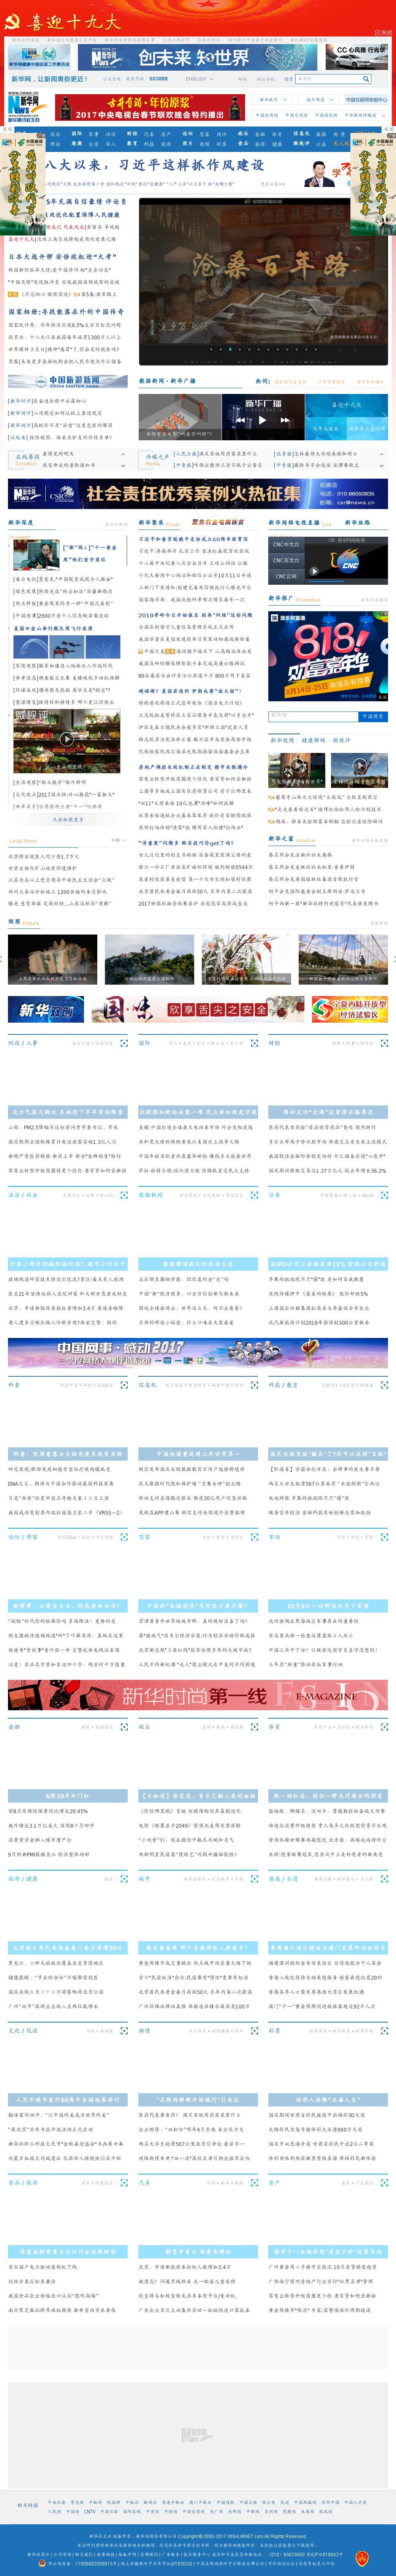 Xinhua at Tuesday Oct. 10, 2017, 8:15 a.m. UTC